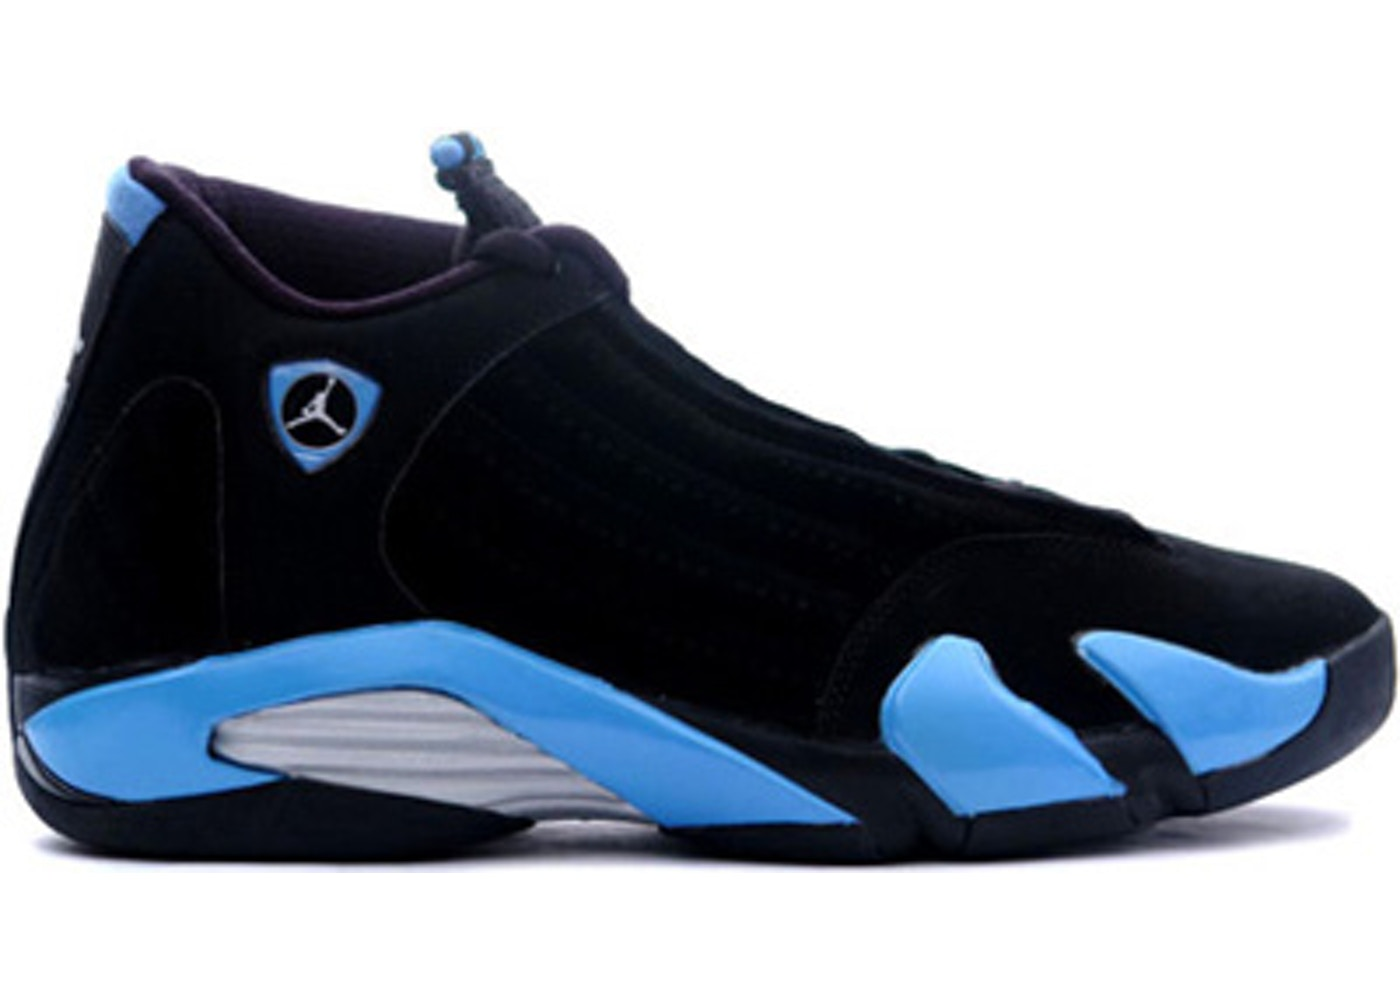 eddbb9da1b4161 Buy Air Jordan 14 Shoes   Deadstock Sneakers